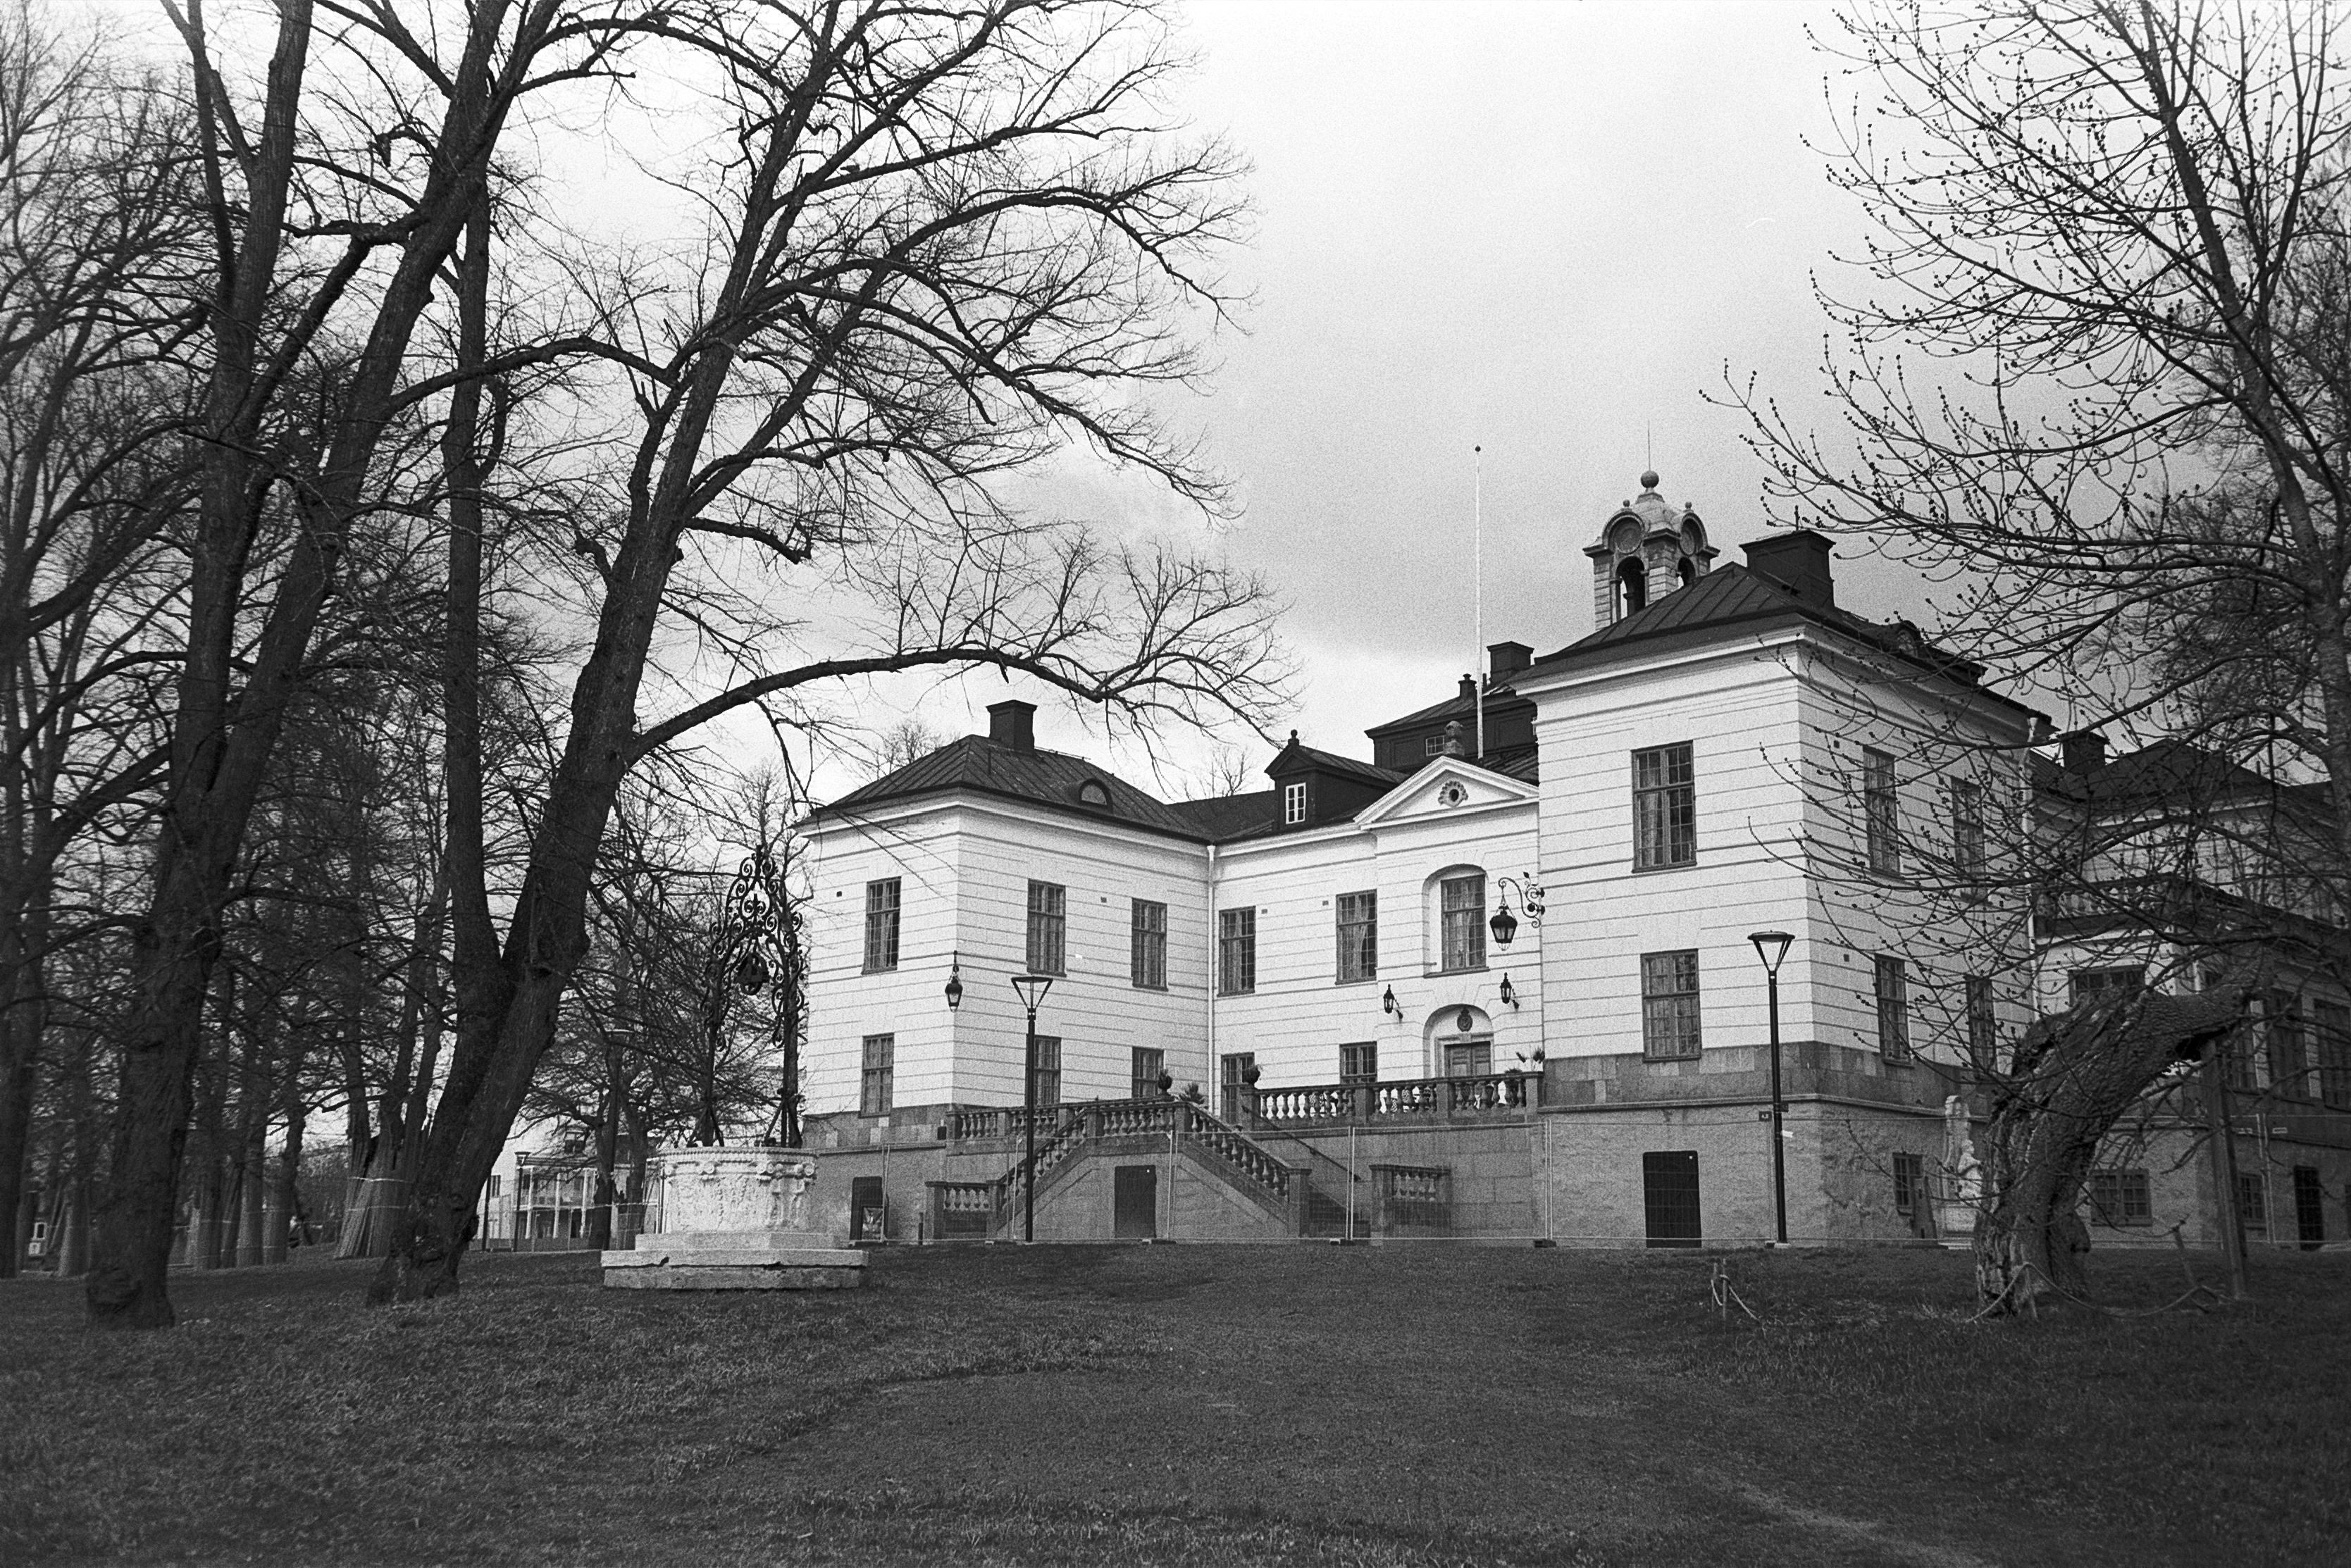 Näsby manor (Pic: Skoge Farman)